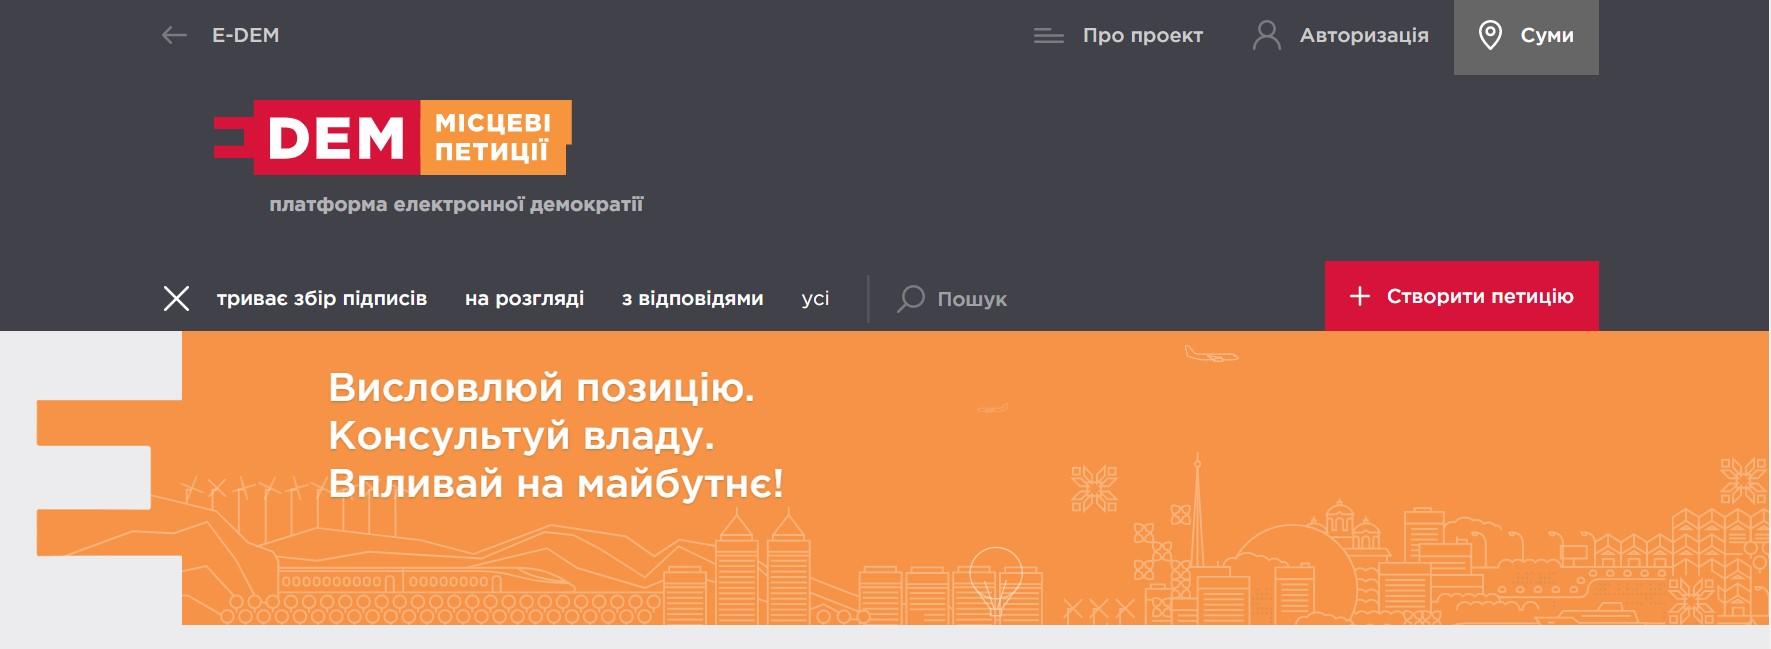 Сайт електронних петицій. Скріншот: petition.e-dem.ua/sumy